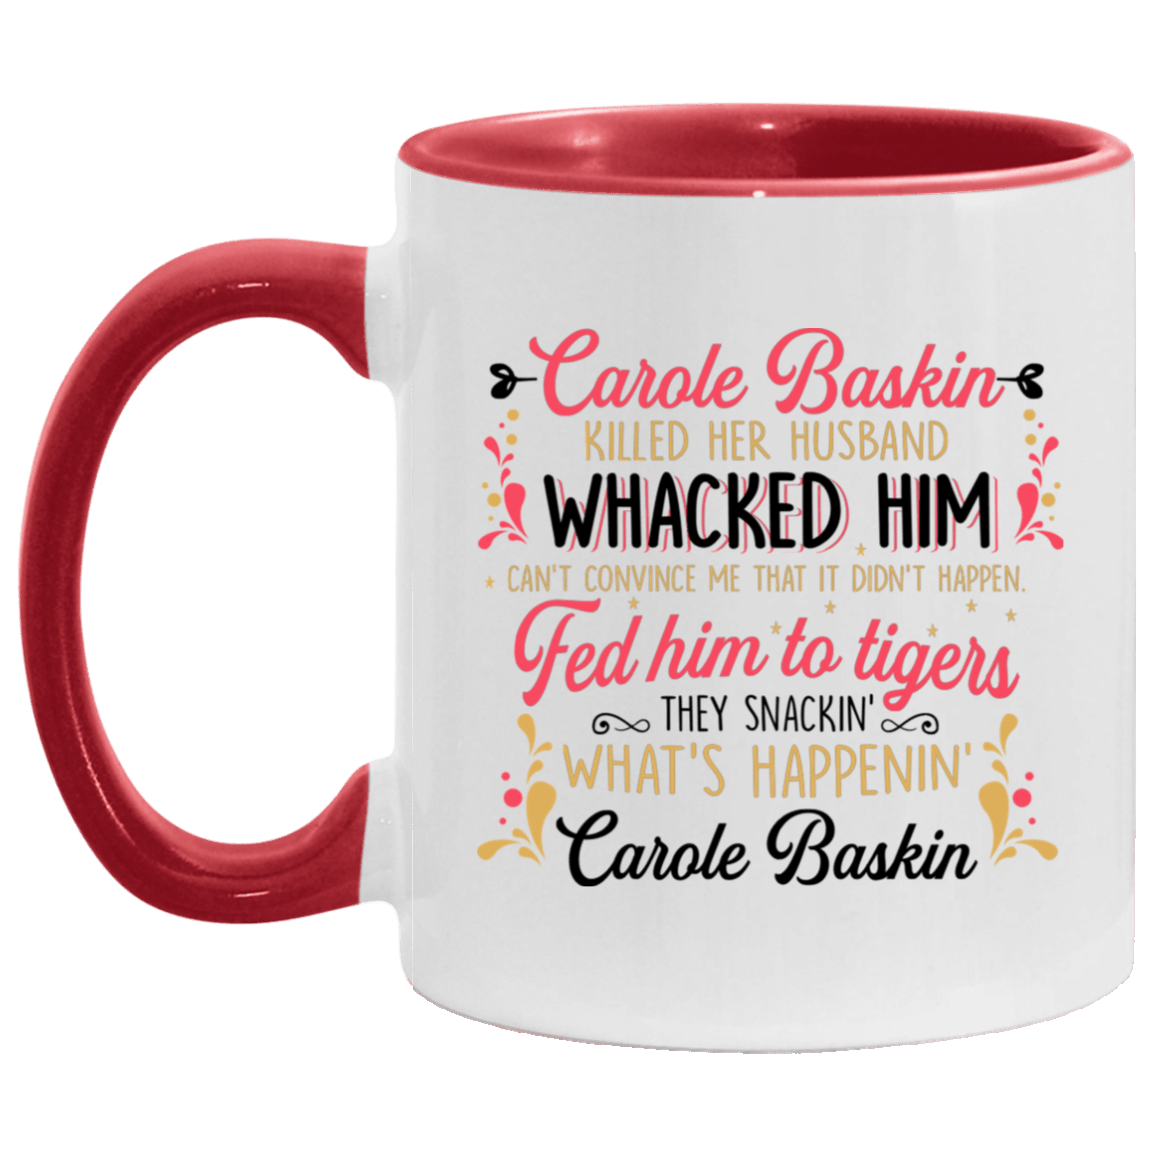 Carole Baskin Killed Her Husband Whacked Him Funny Ceramic Coffee Mug